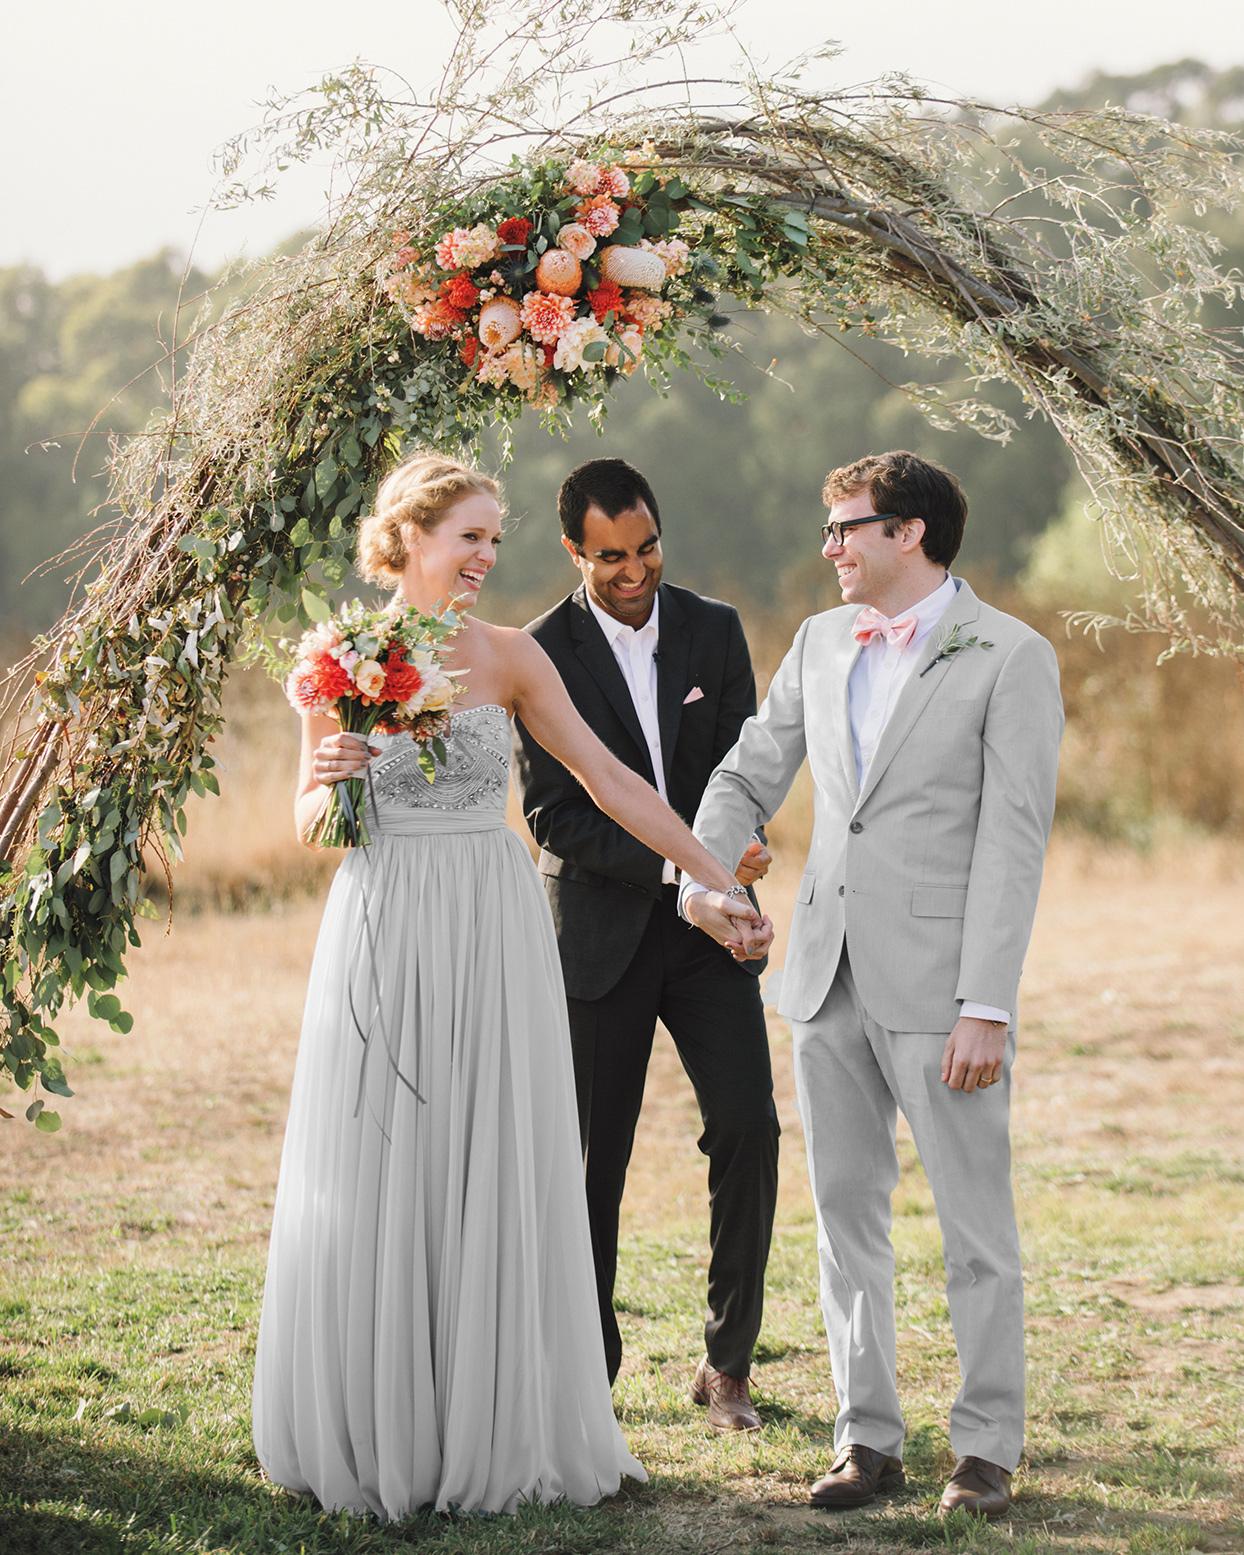 anna timothy wedding vows under twig branch arch